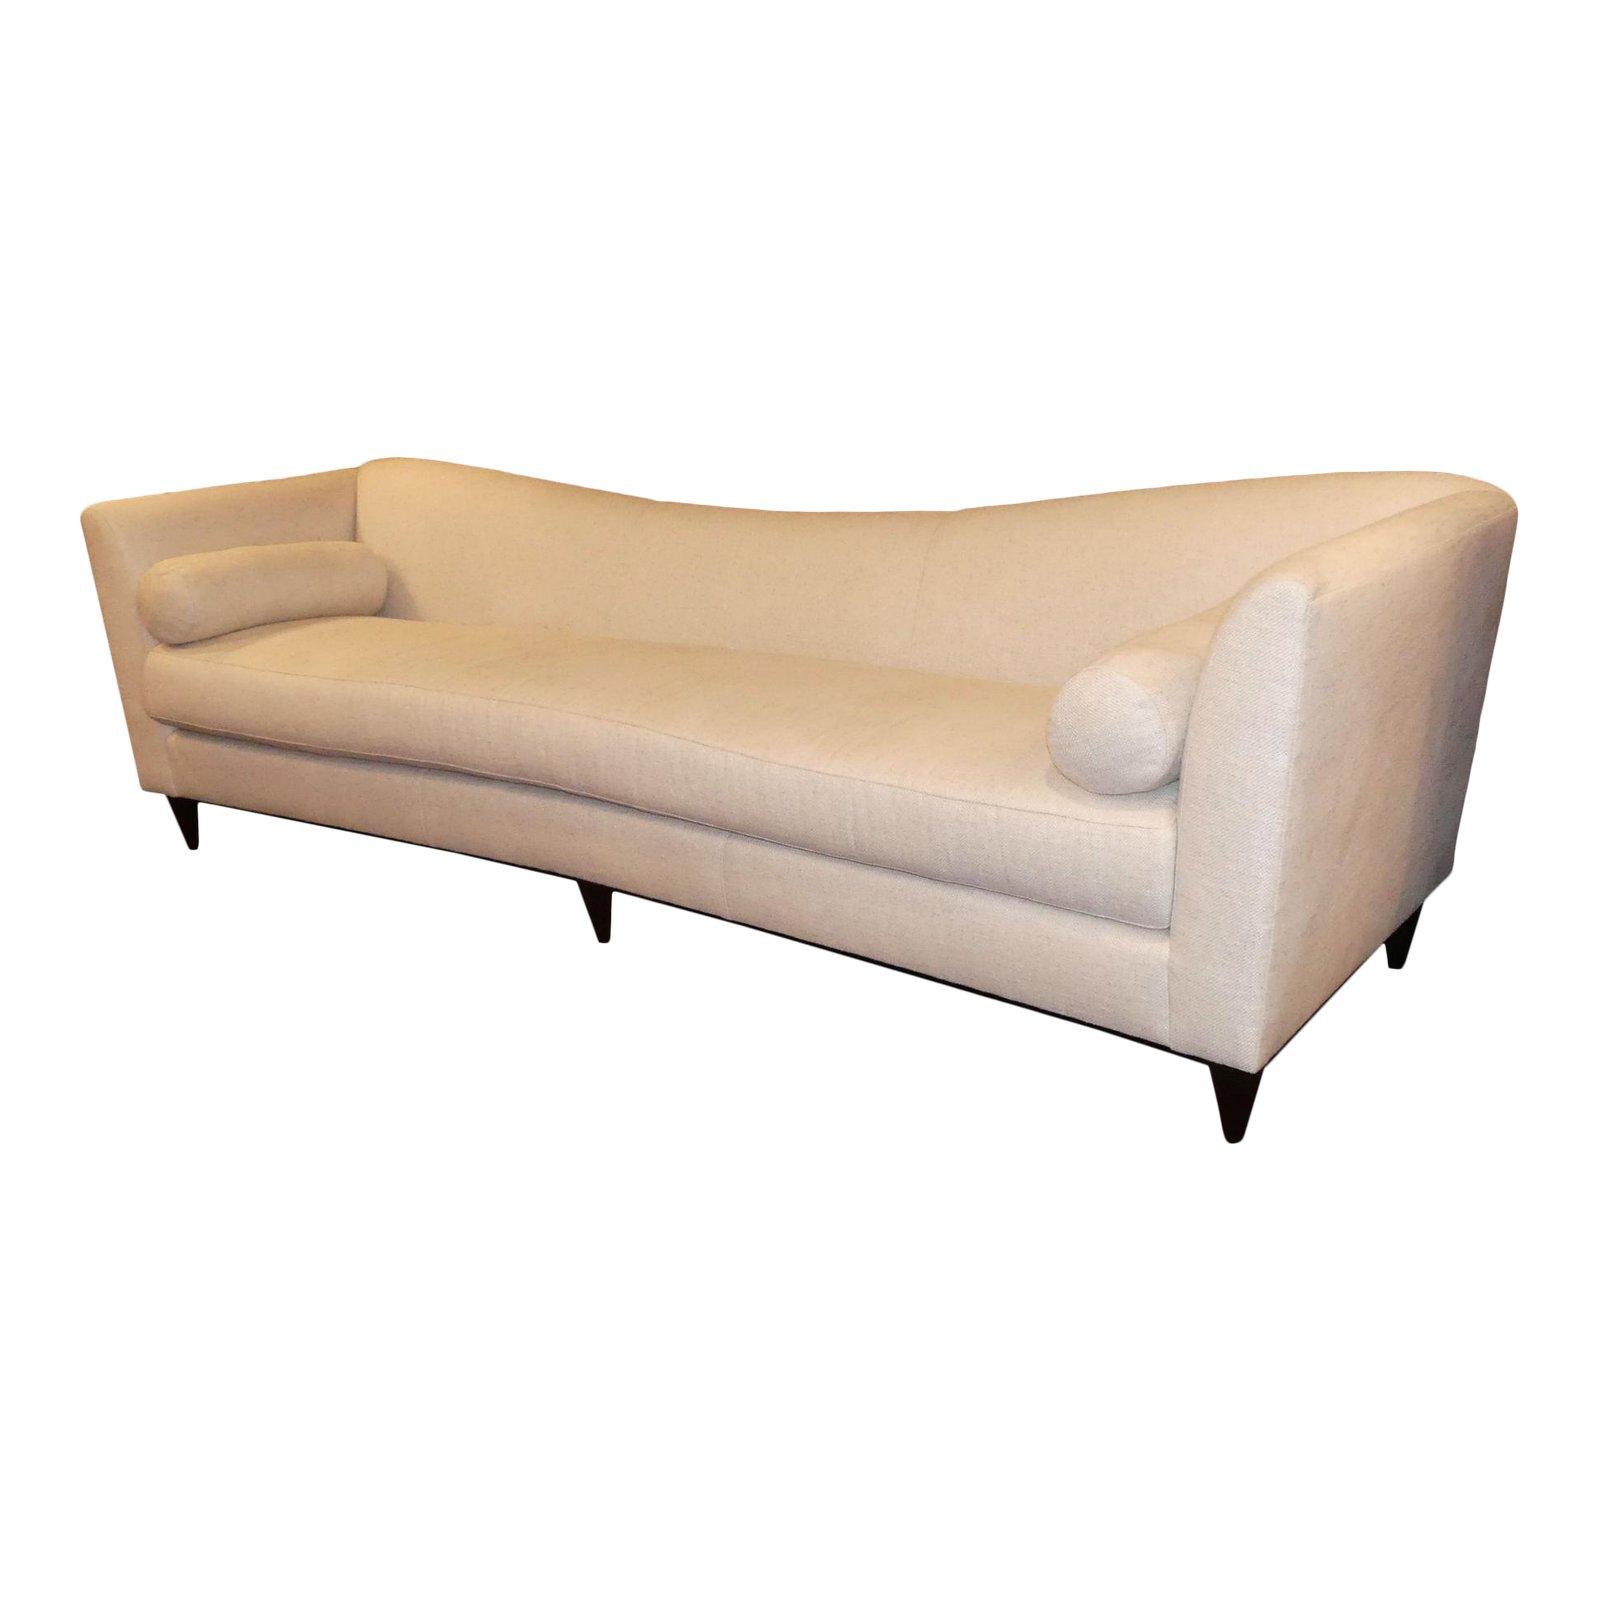 SOLD  Baker Furniture Thomas Pheasant Patricia Sofa